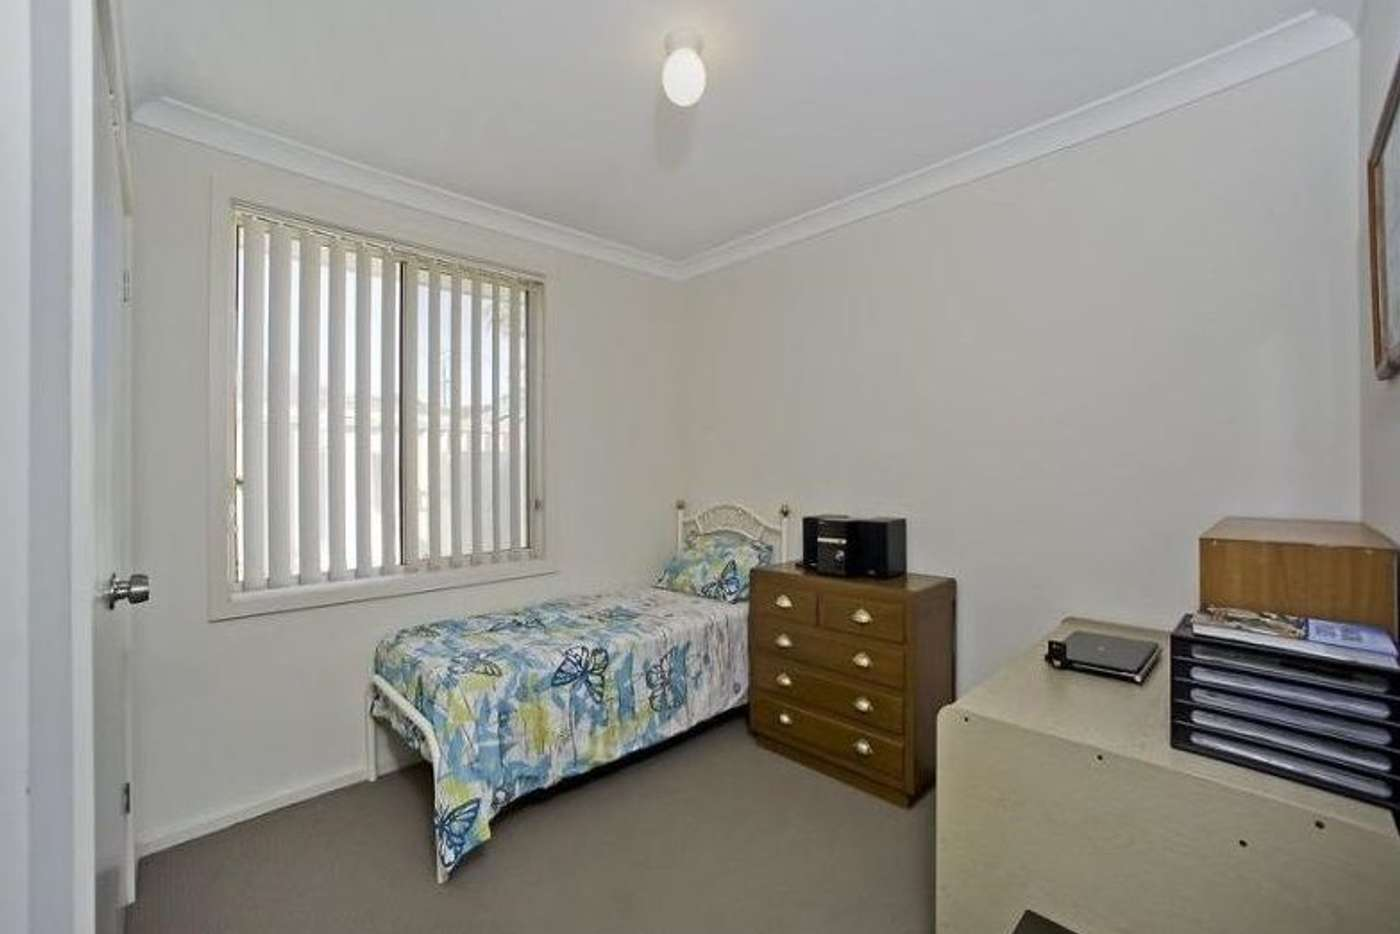 Seventh view of Homely house listing, 12 Workman Street, Birkenhead SA 5015